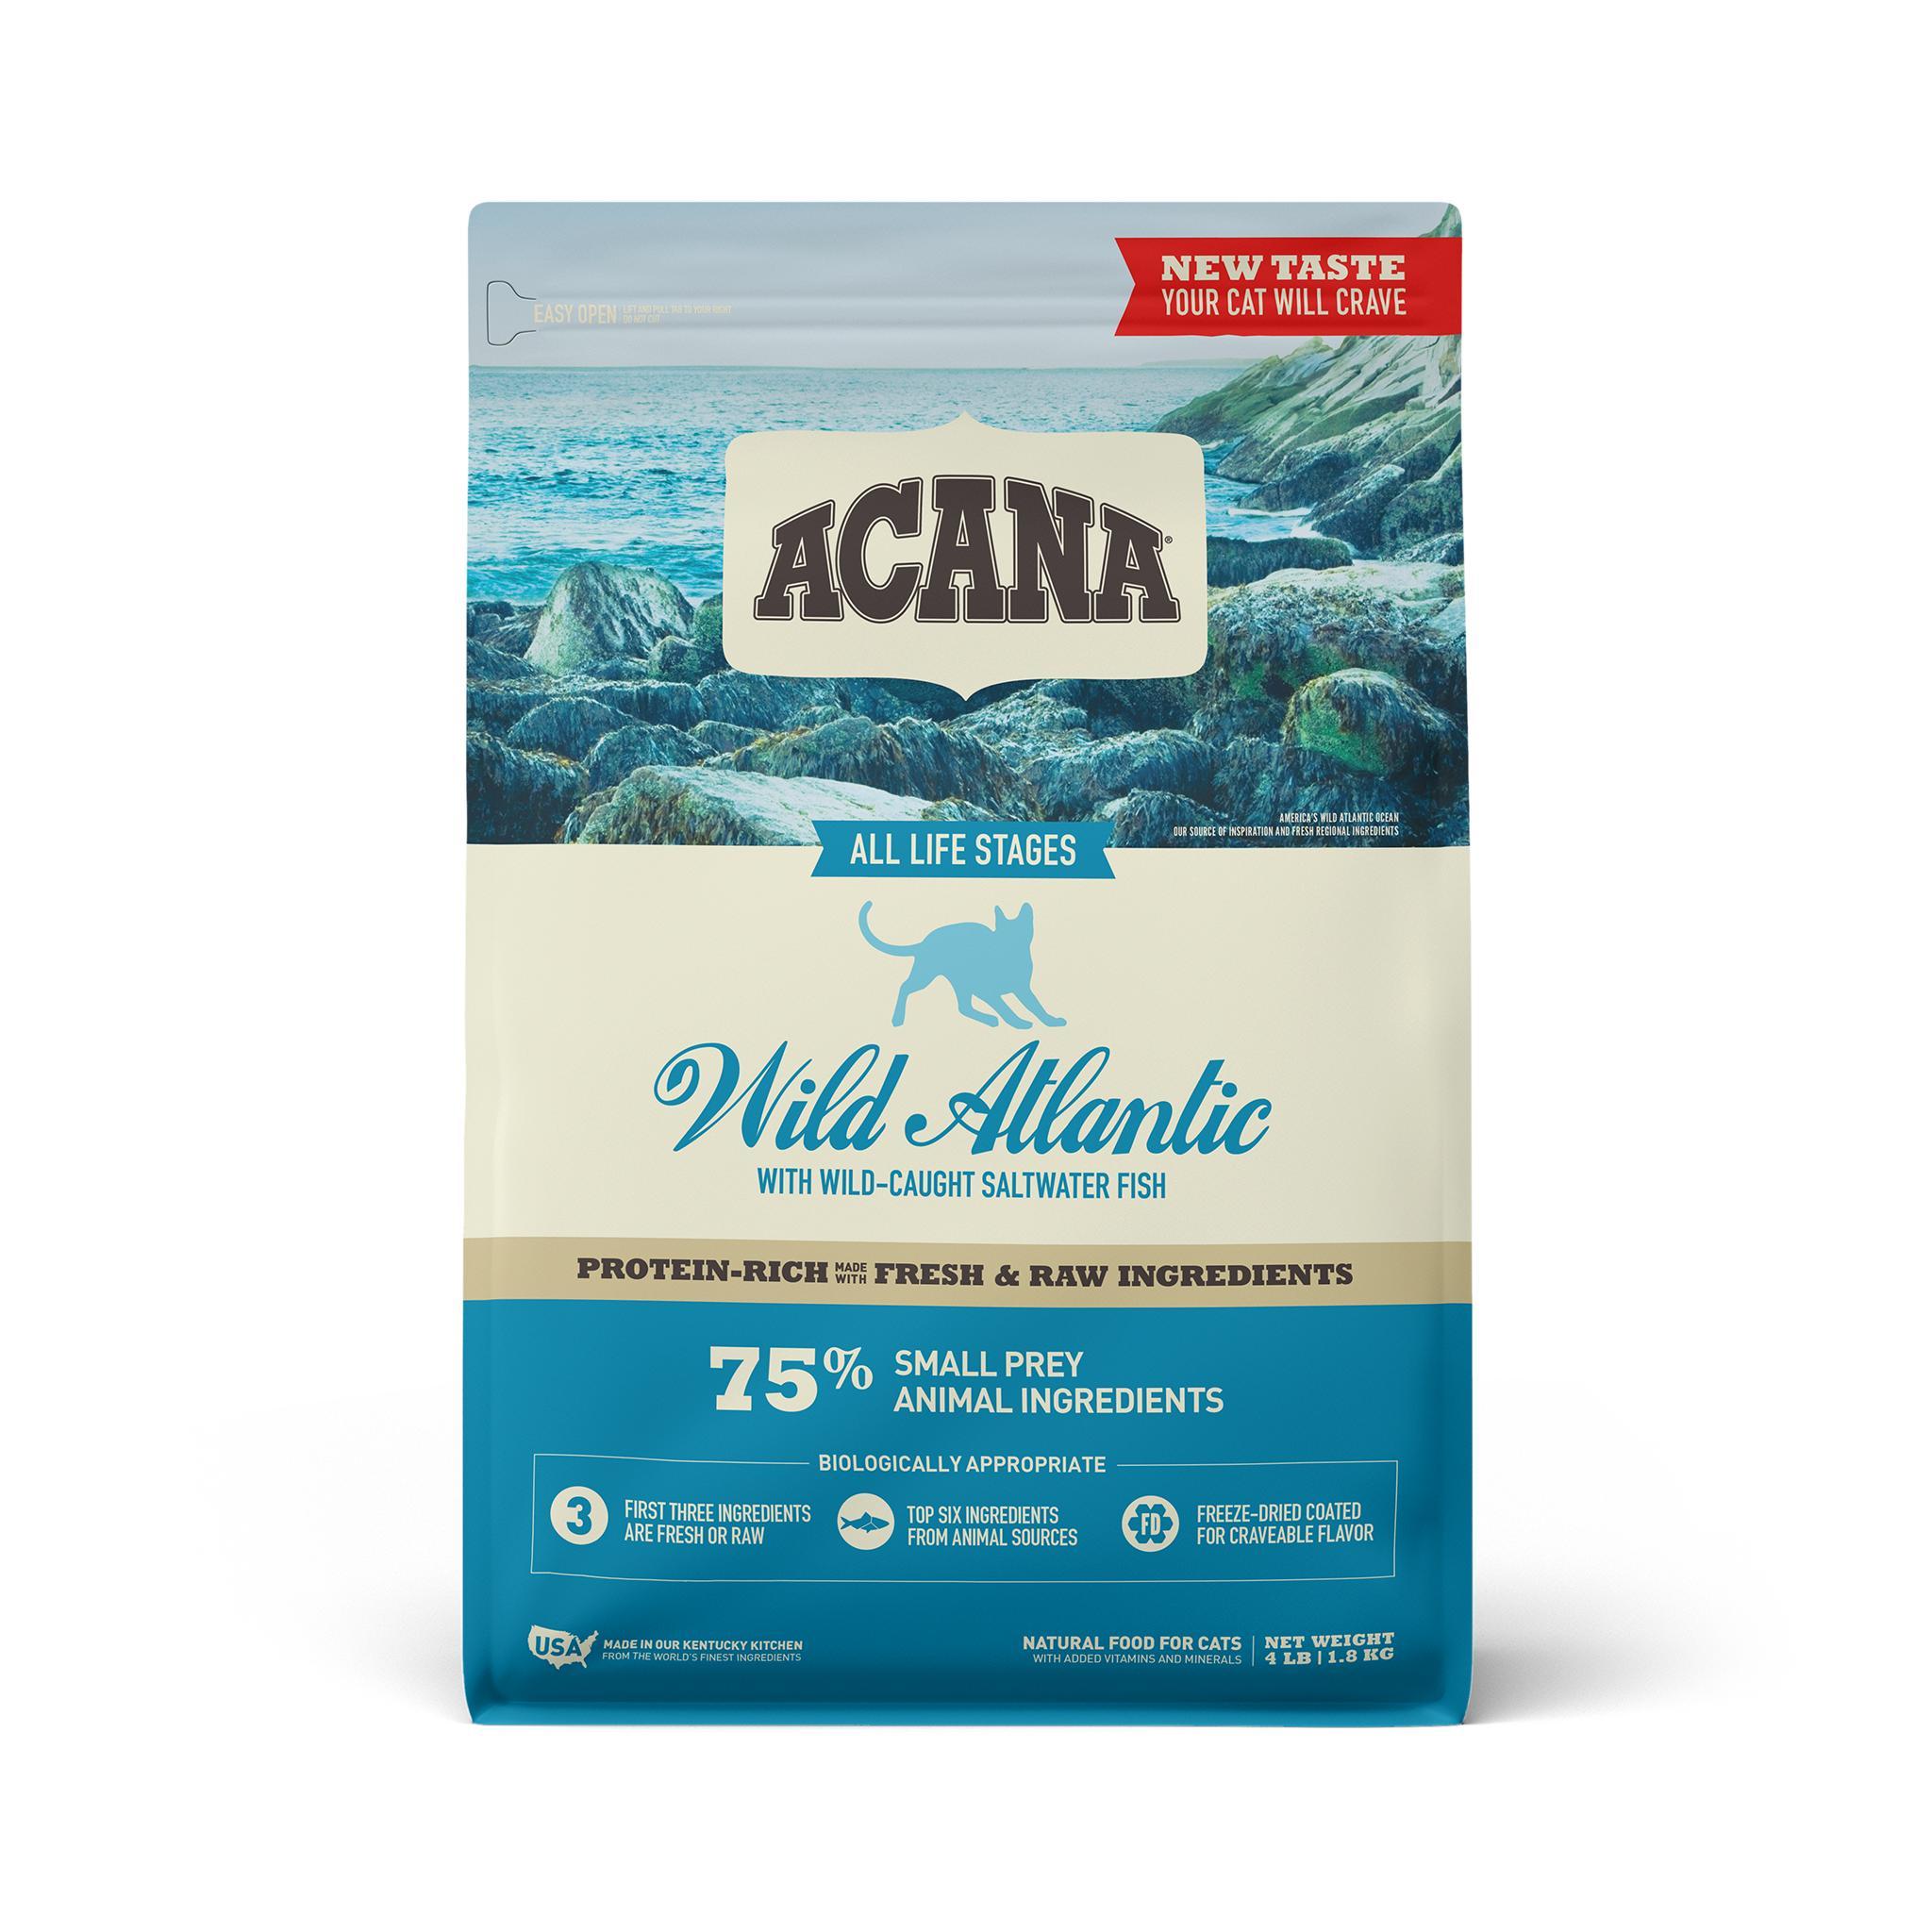 ACANA Wild Atlantic Grain-Free Dry Cat Food, 4-lb bag